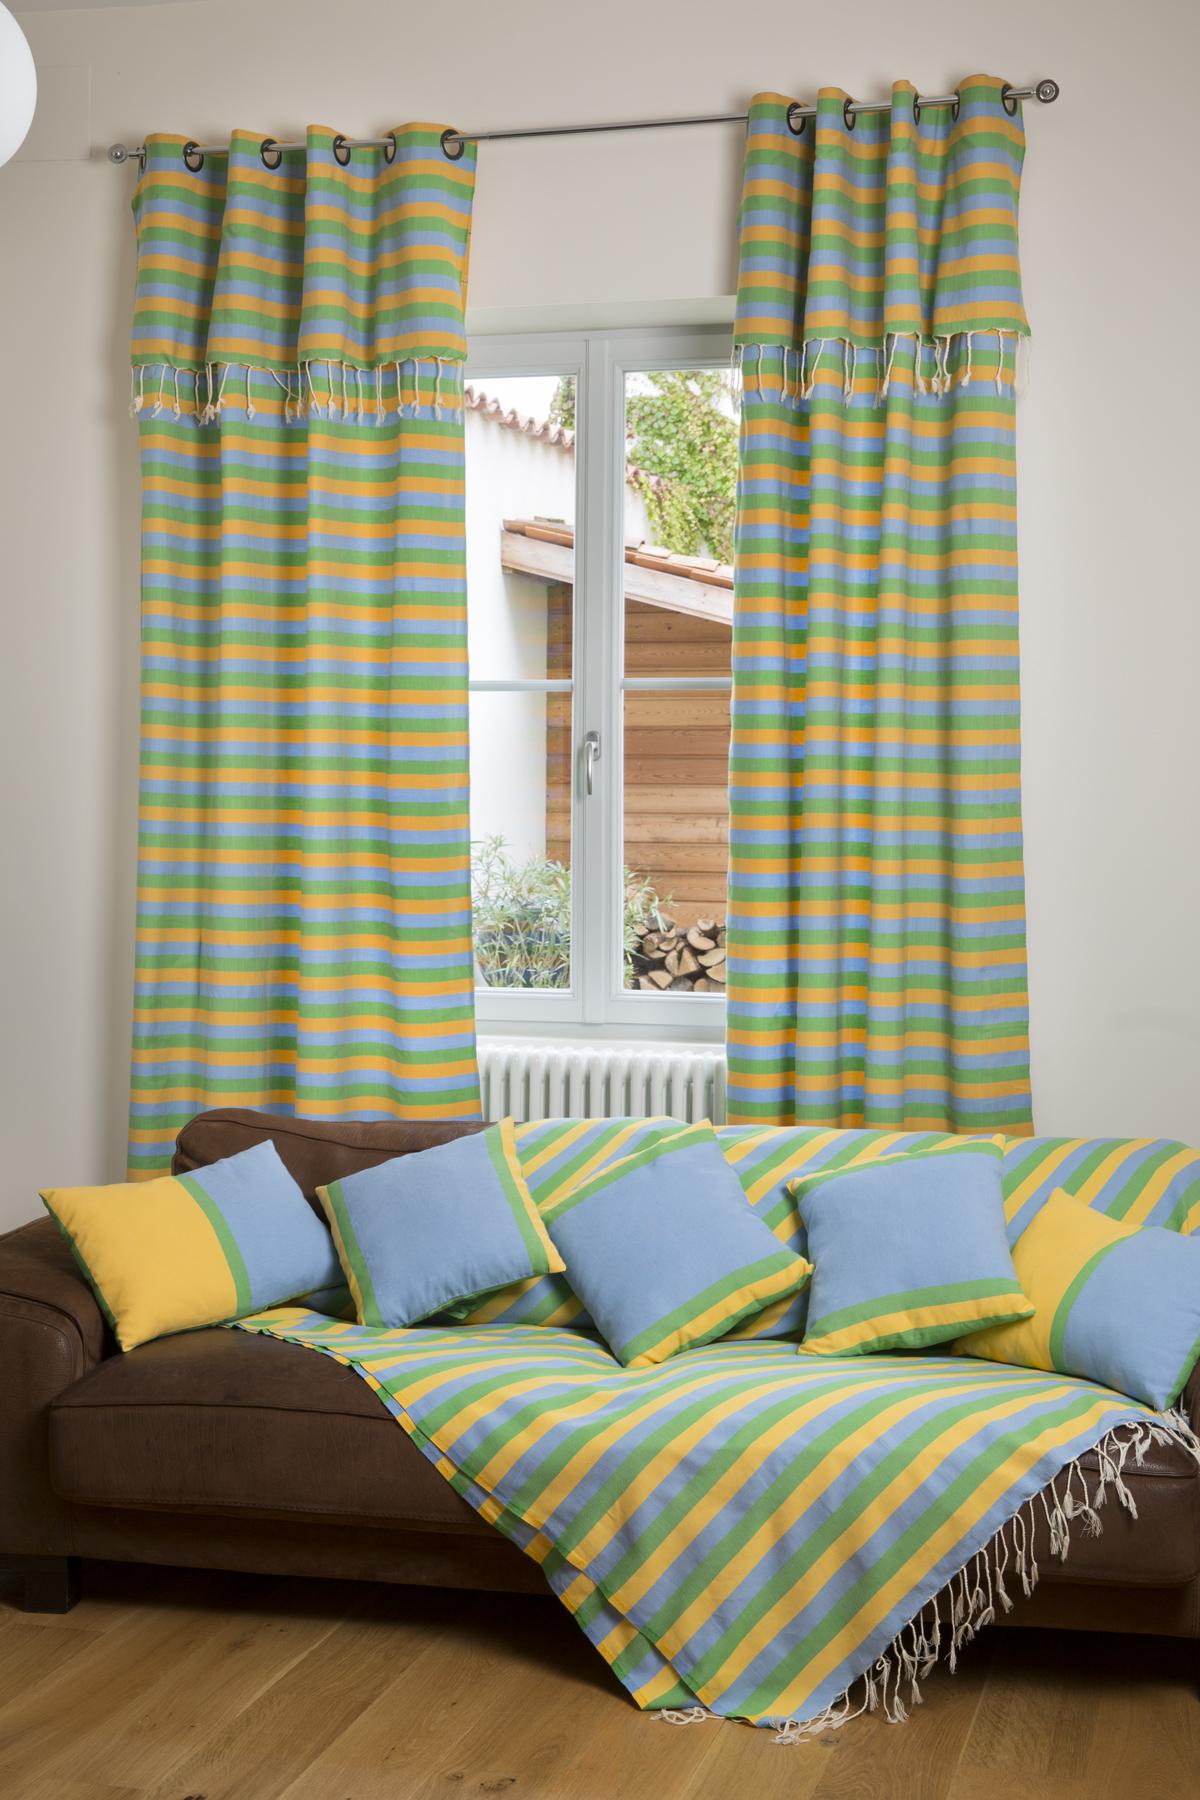 DJERBA - Rideau ajustable coton jaune turquoise vert 140 x 250 à 280